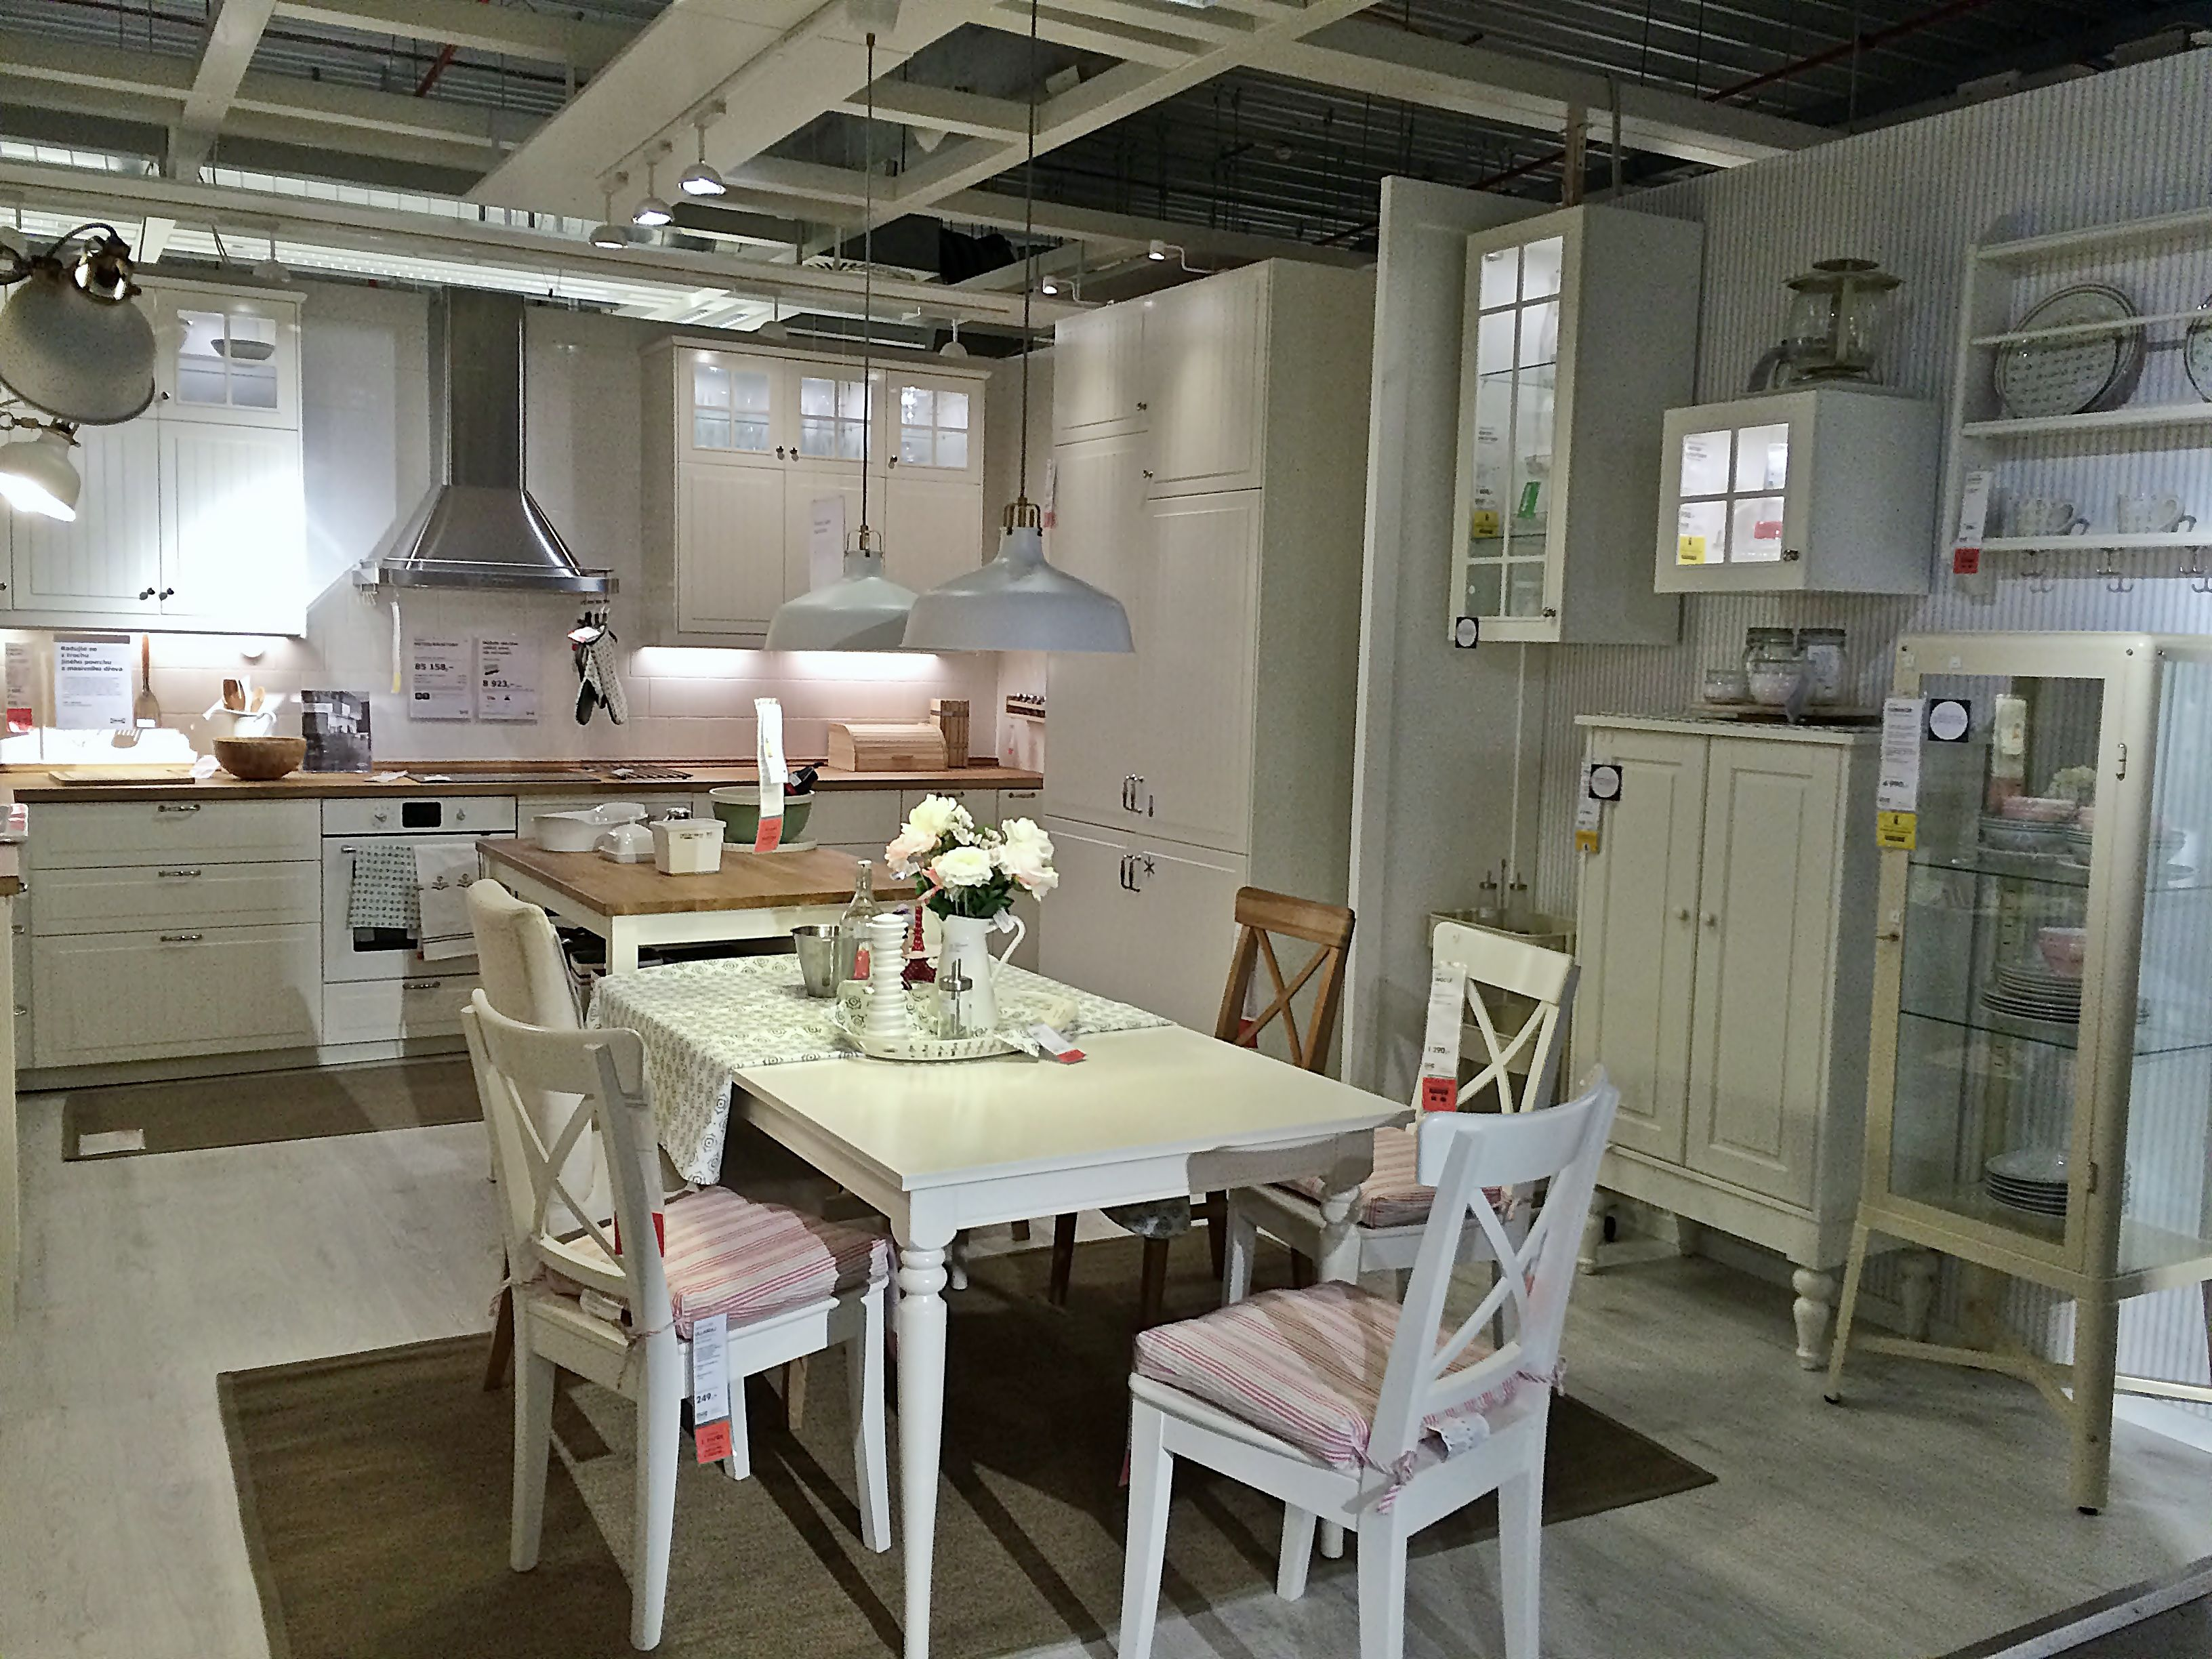 IKEA METOD KROKTORP  IKEA  Pinterest  Ikea -> Kuchnia Spotkan Ikea Warszawa